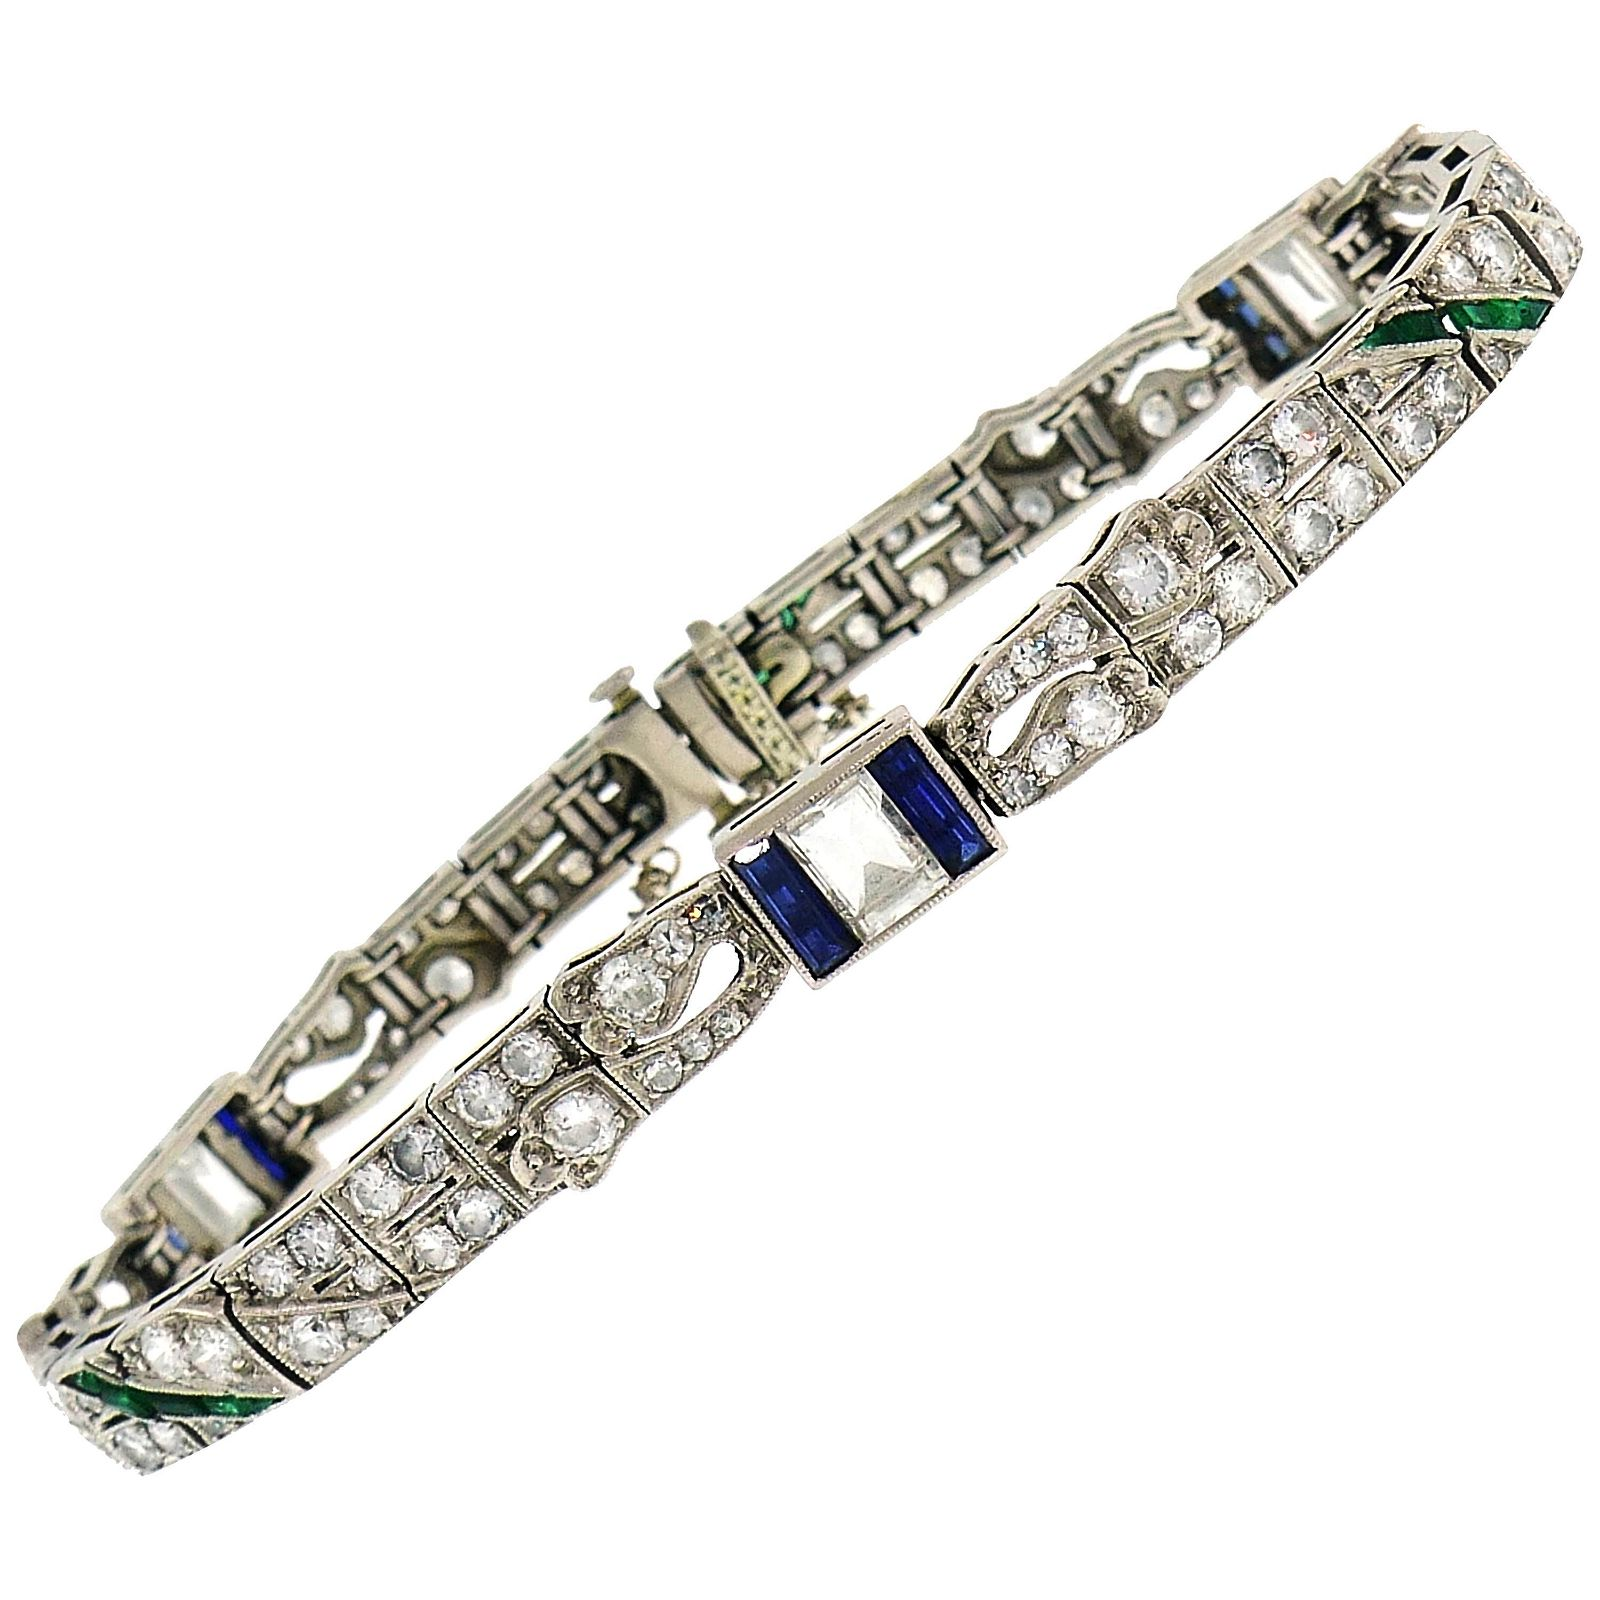 Art Deco Platinum Bracelet with Diamond Sapphire